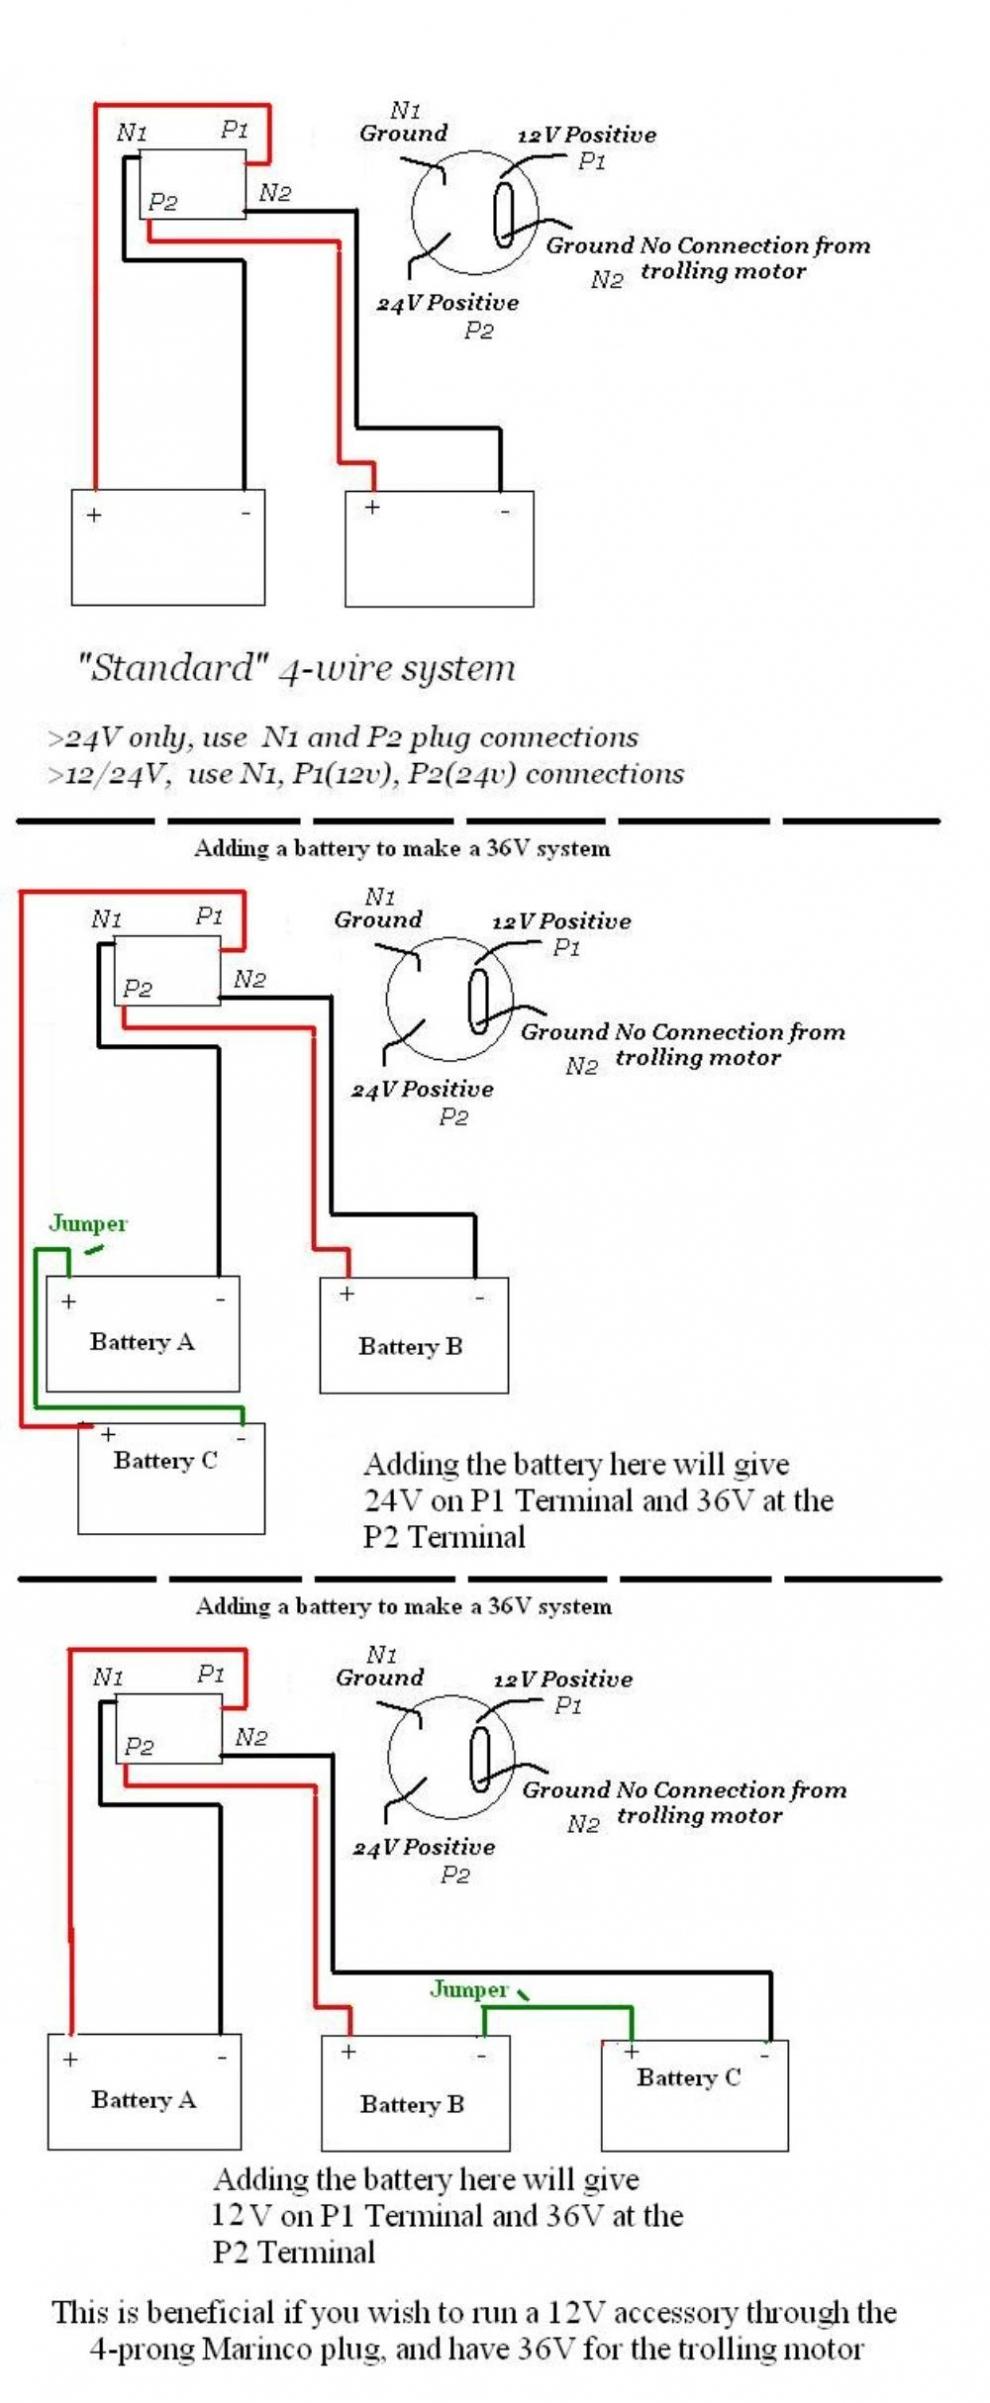 Trolling Motor Wiring Diagram 12 Volt Inspirationa Trolling Motor - Trolling Motor Wiring Diagram